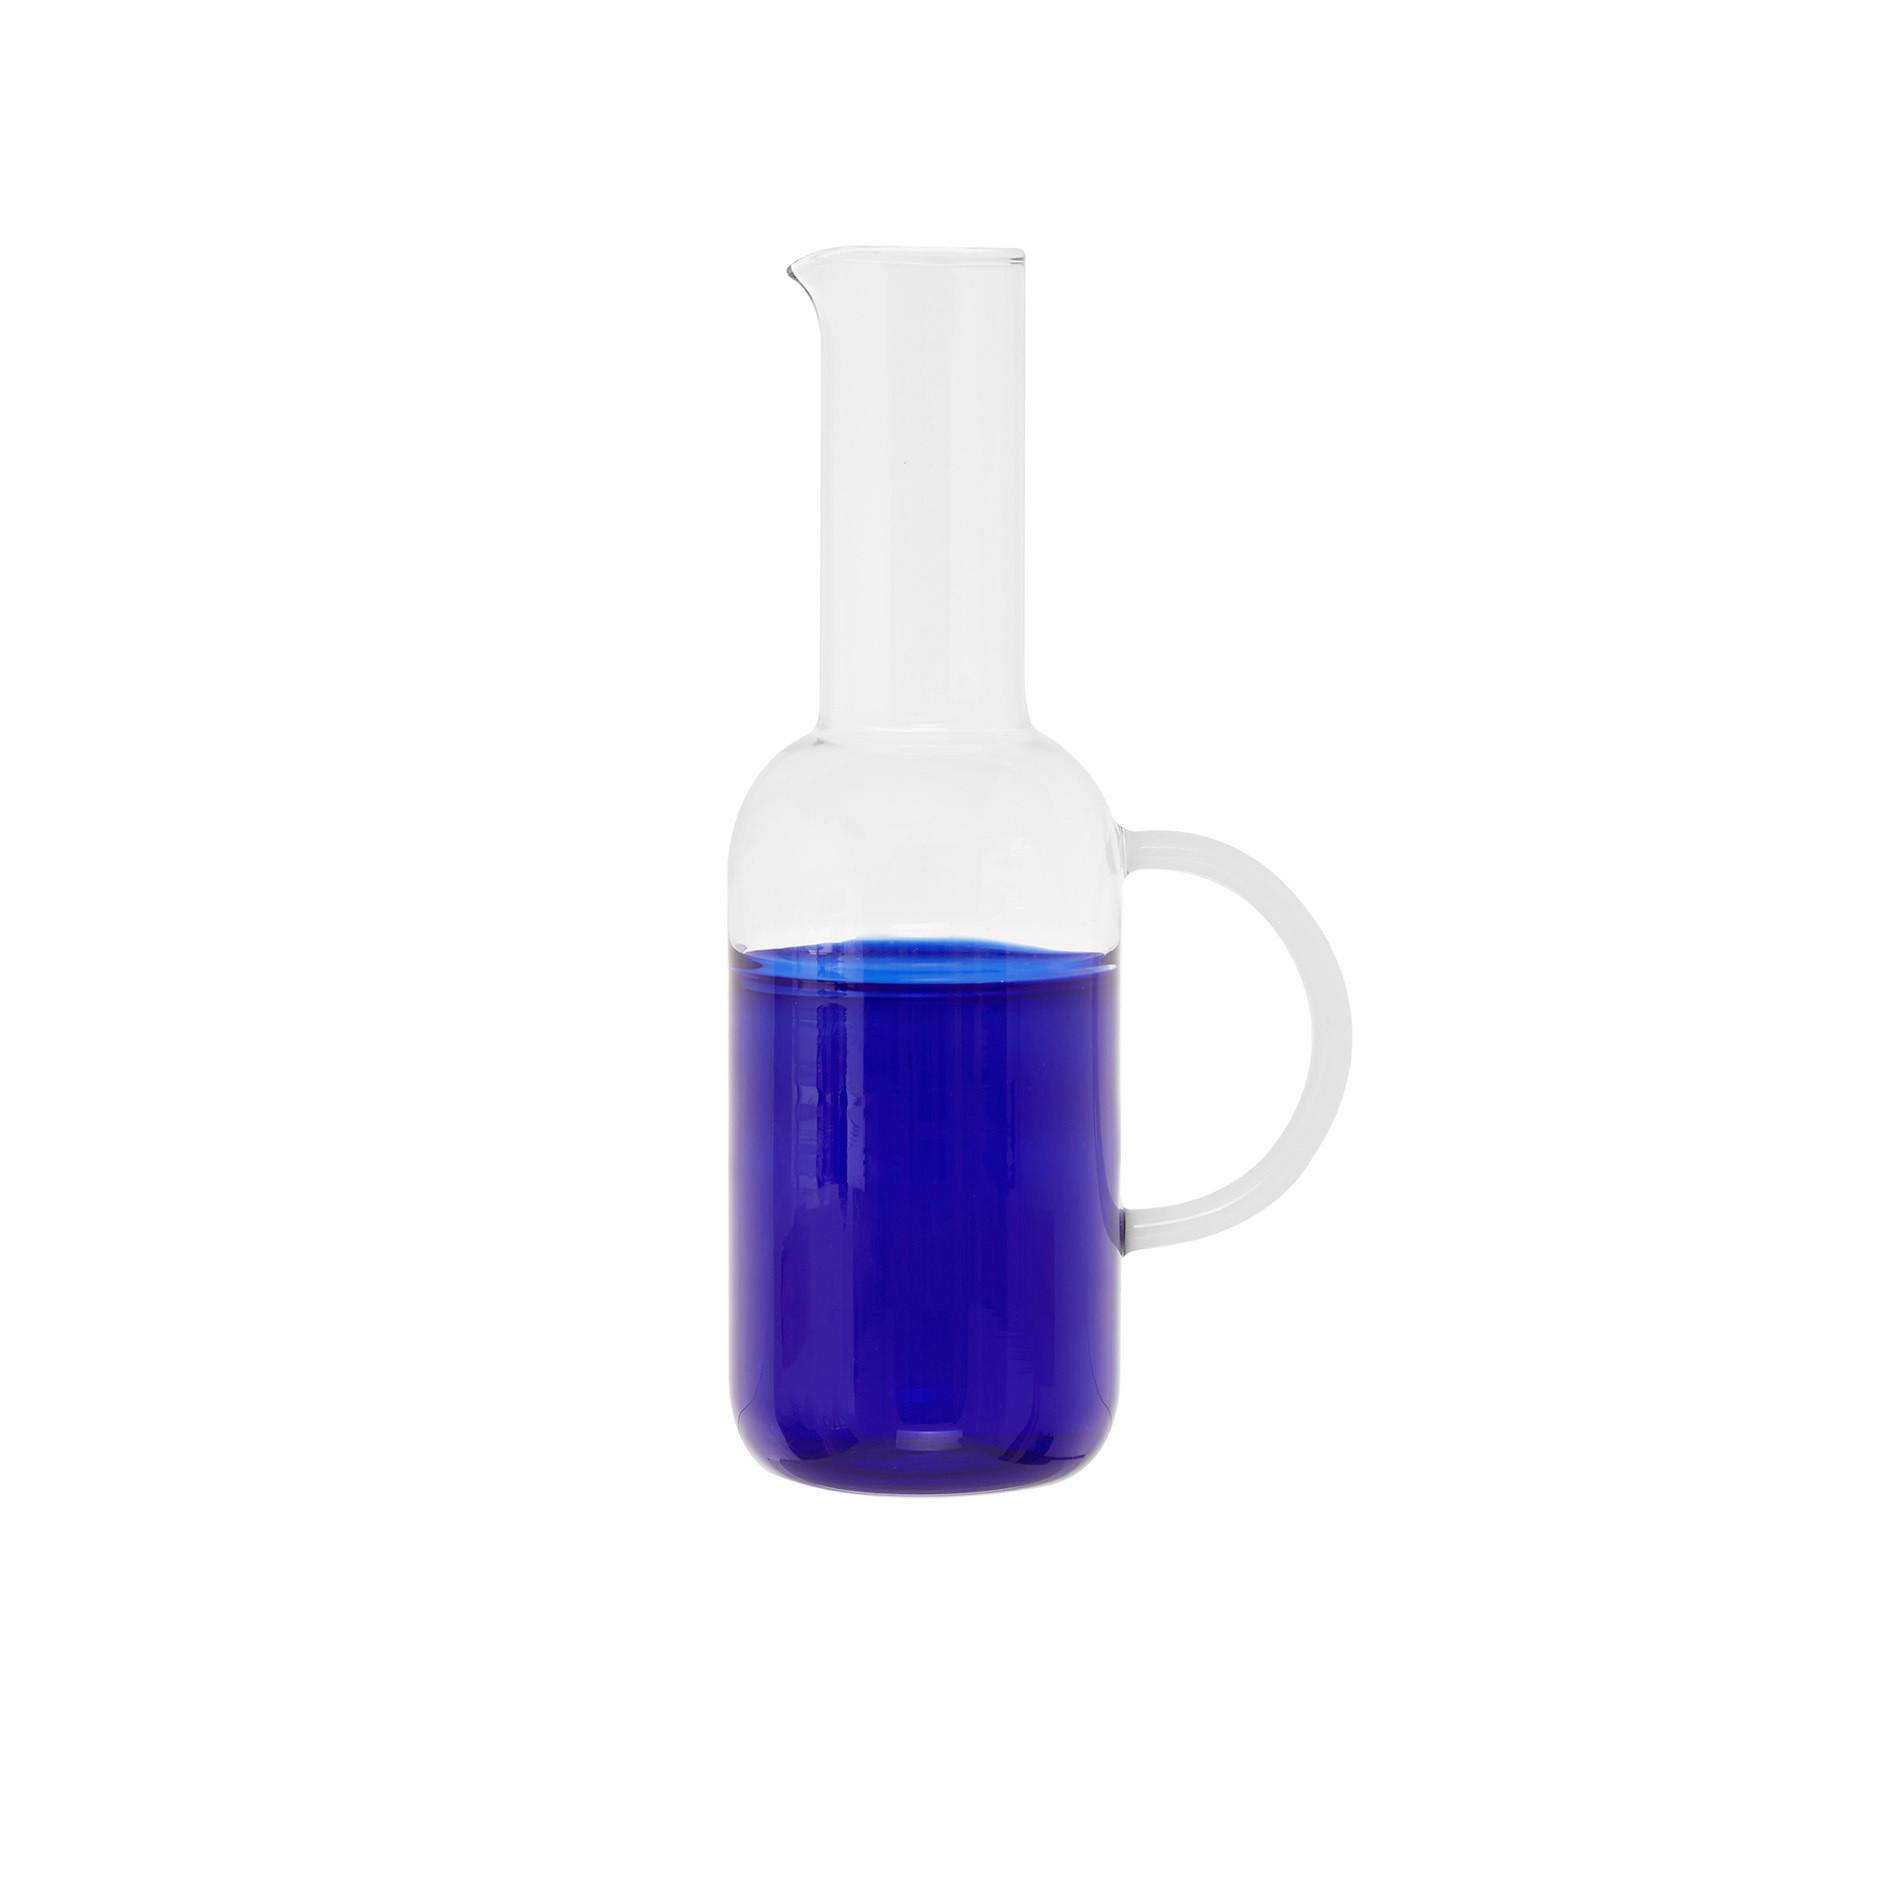 Caraffa vetro base colorata, Bianco/Blu, large image number 0